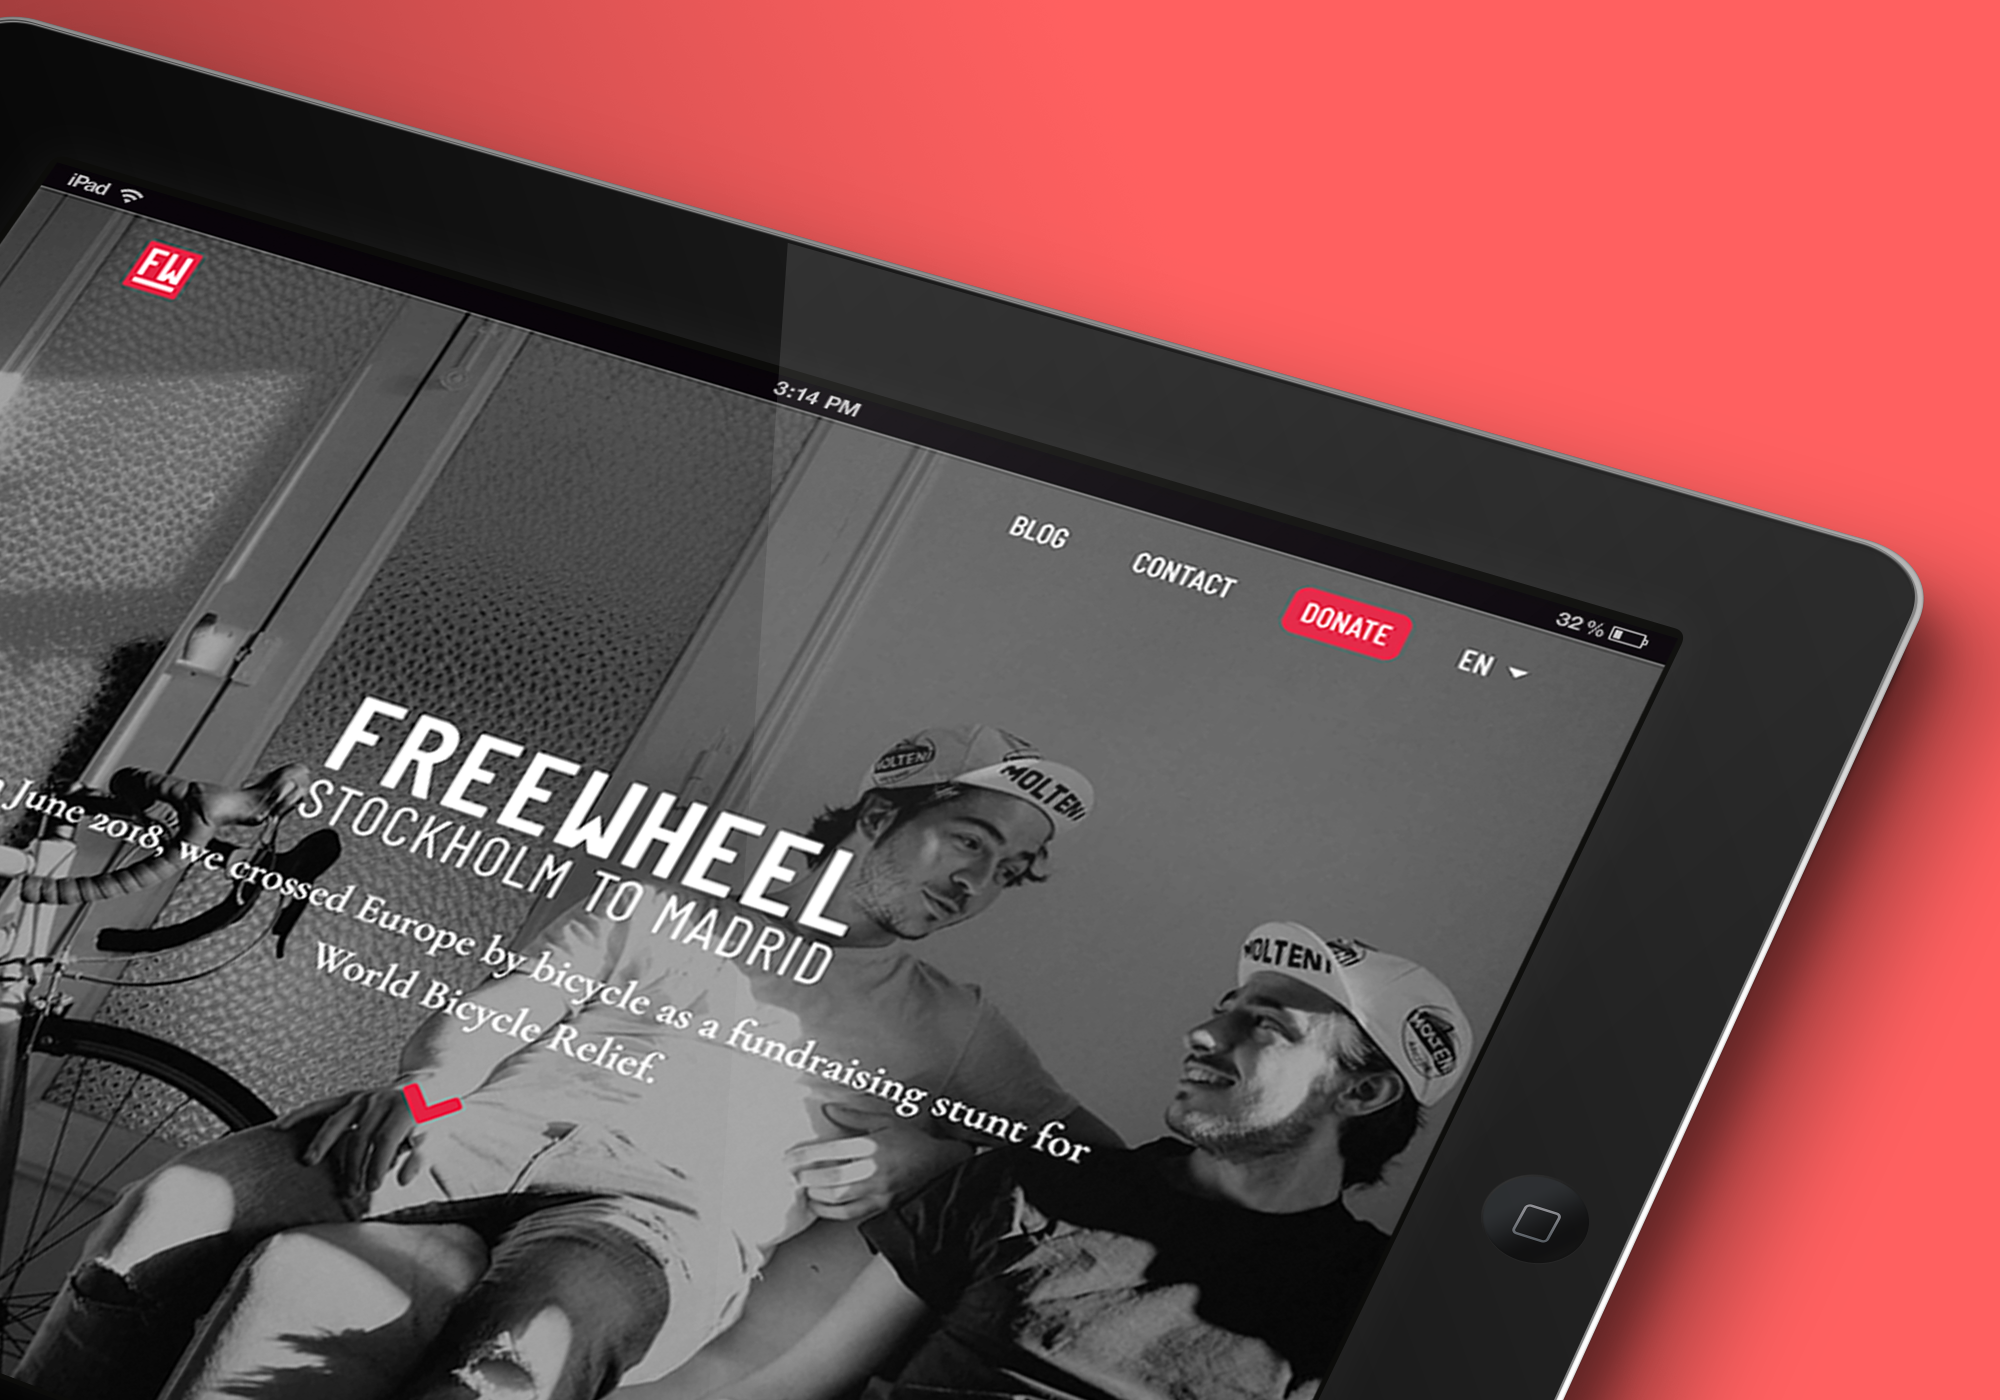 Freewheel's website